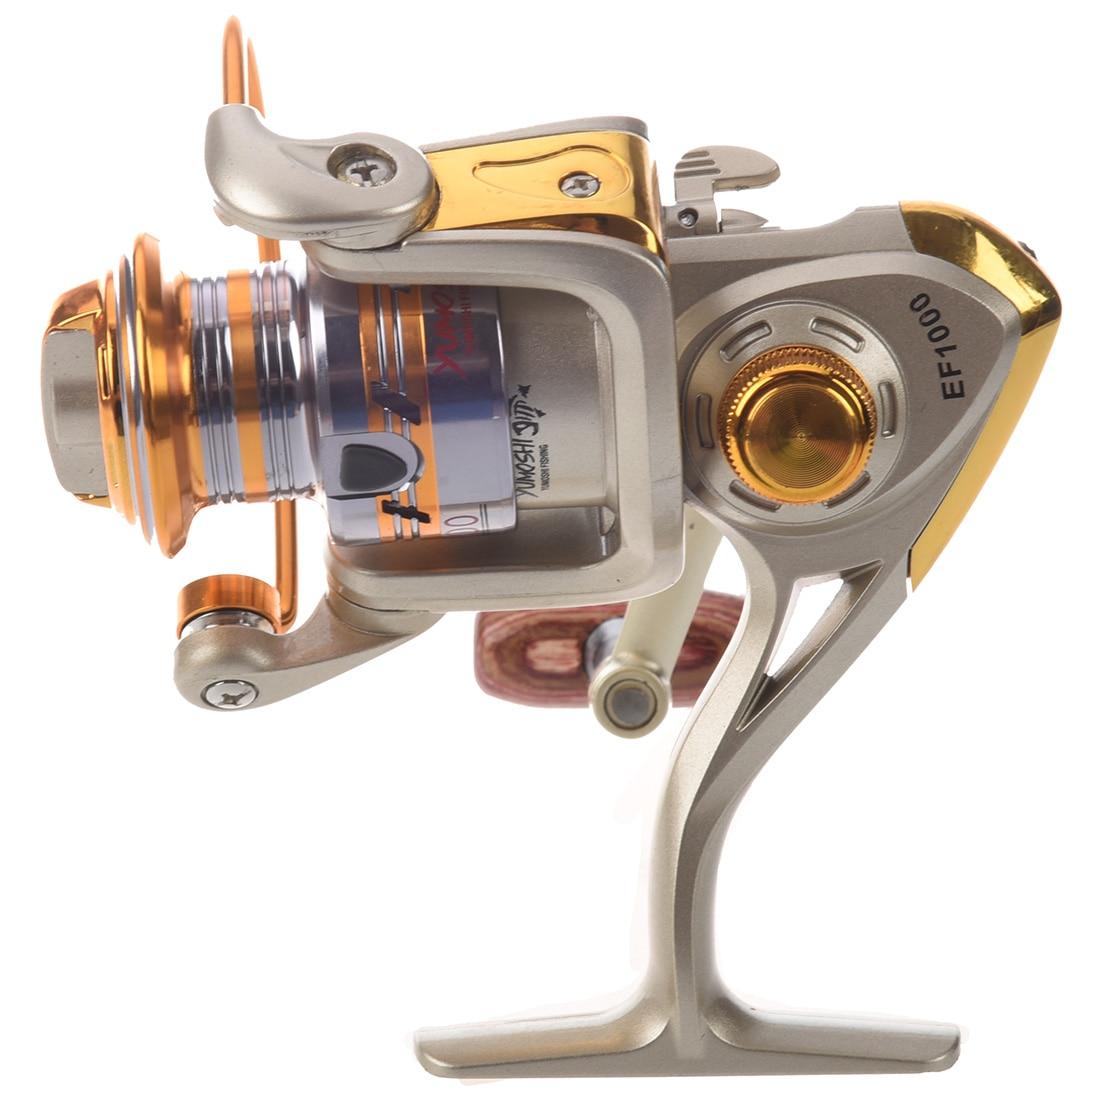 Spool Aluminum Spinning fly fishing reel baitcasting fishing reels saltwater okuma baitrunner metal front drag EF1000 churrasqueira para fogão